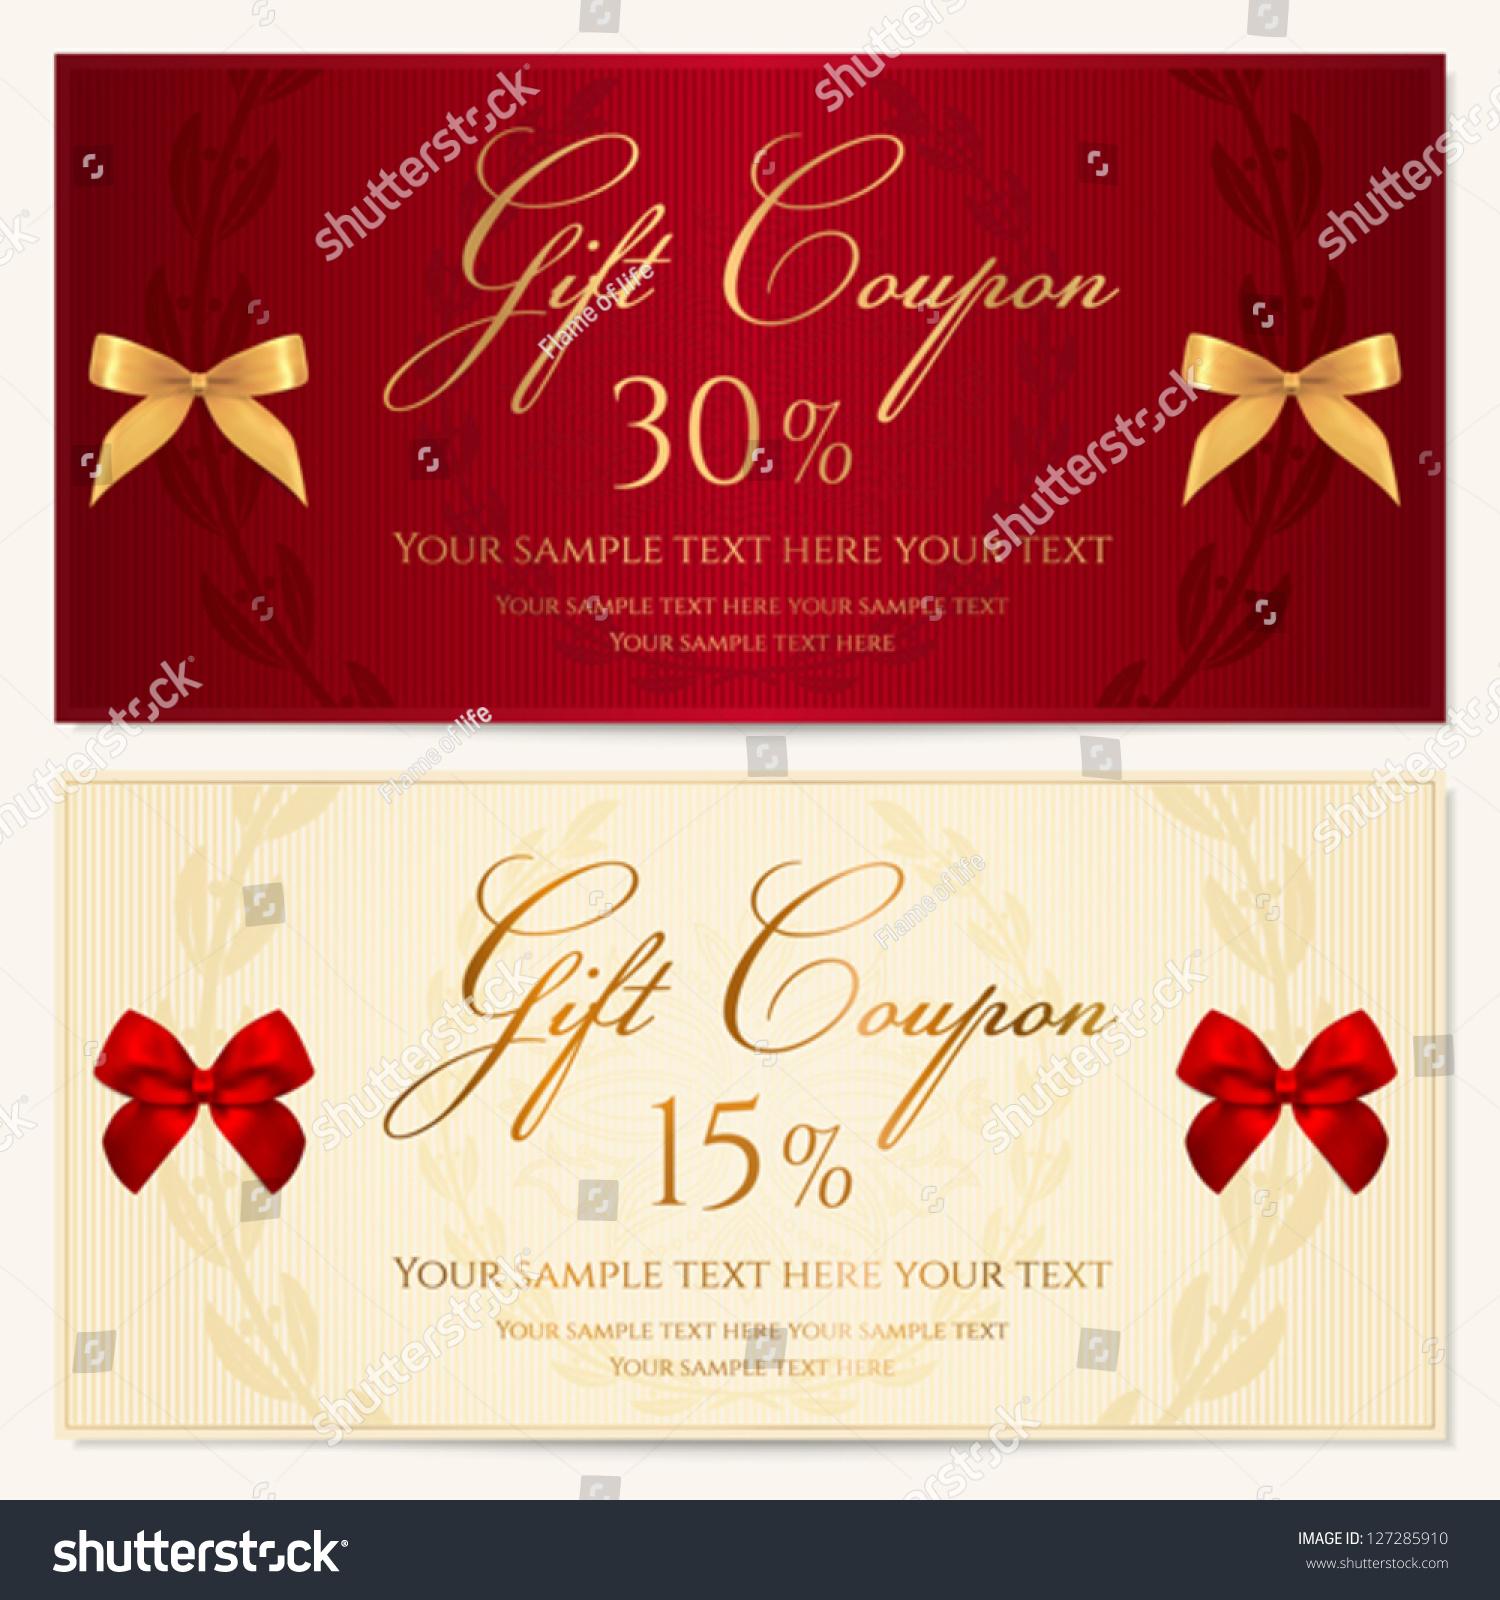 Coupon template vector art : Conscious box coupon code december 2018